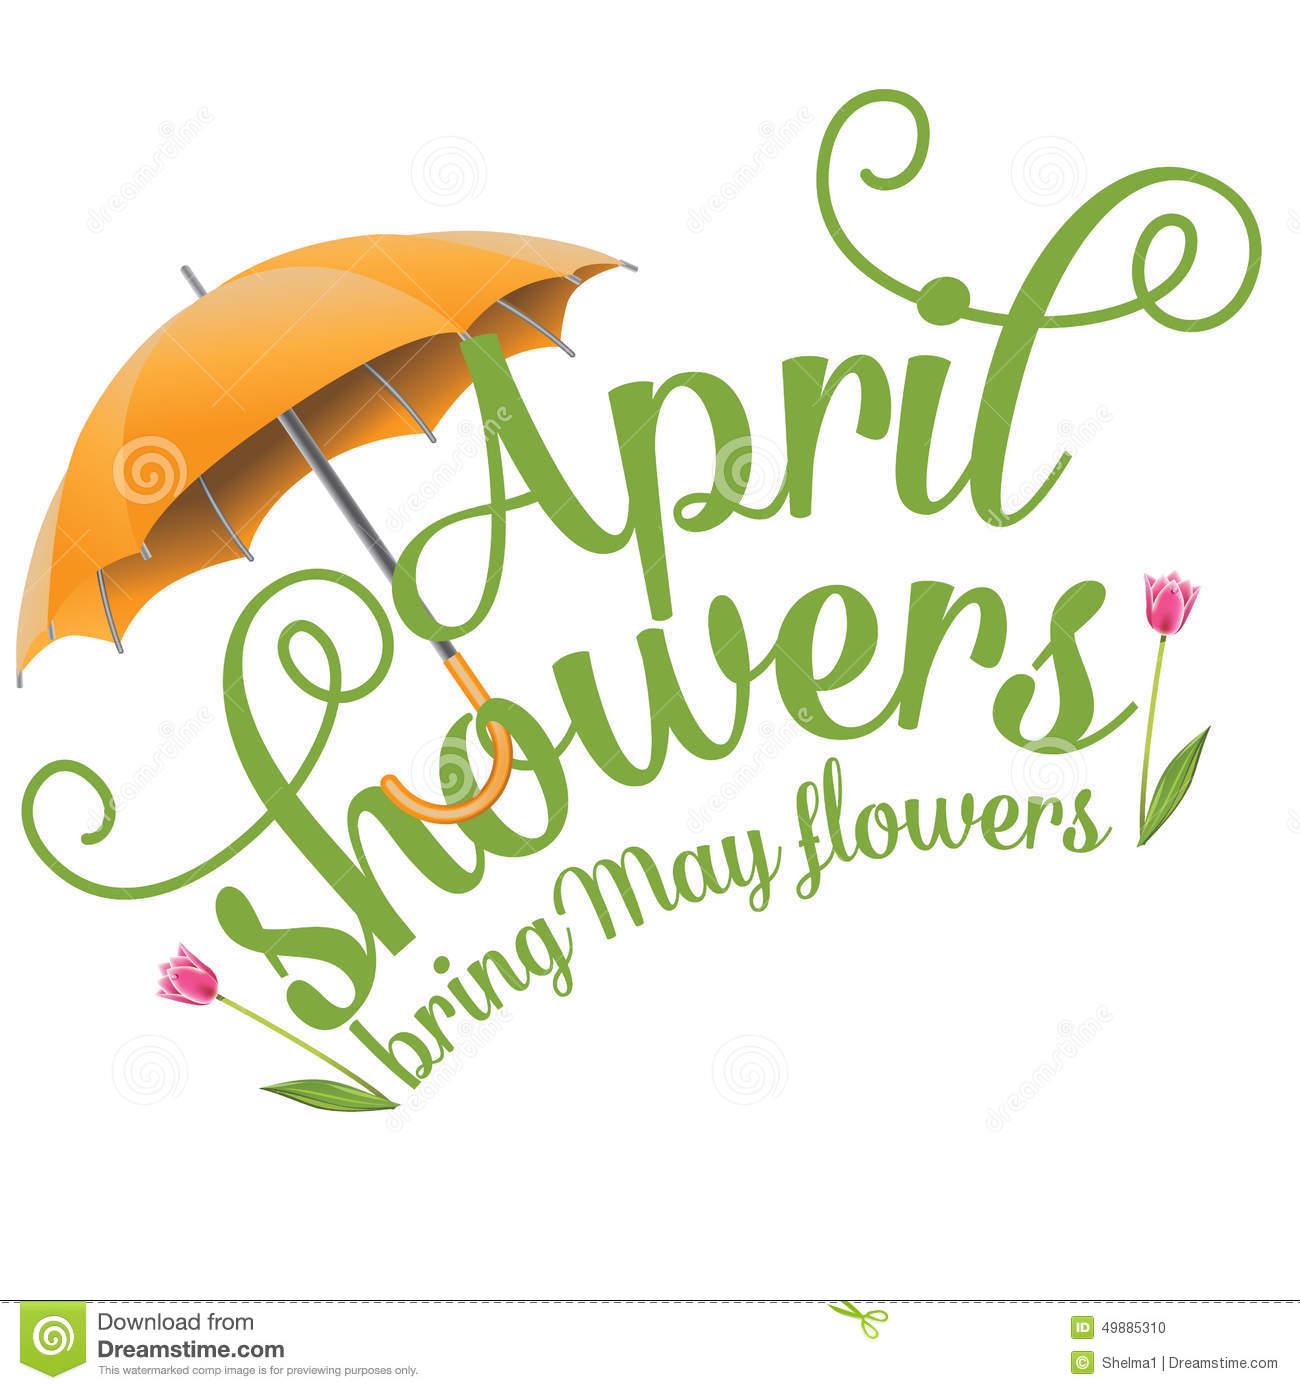 April Clip Art | April Showers Bring May-April Clip Art | April Showers Bring May Flowers Design Stock Vector - Image: 49885310 | APRIL | Pinterest | May flowers, Clip art and Spring-4